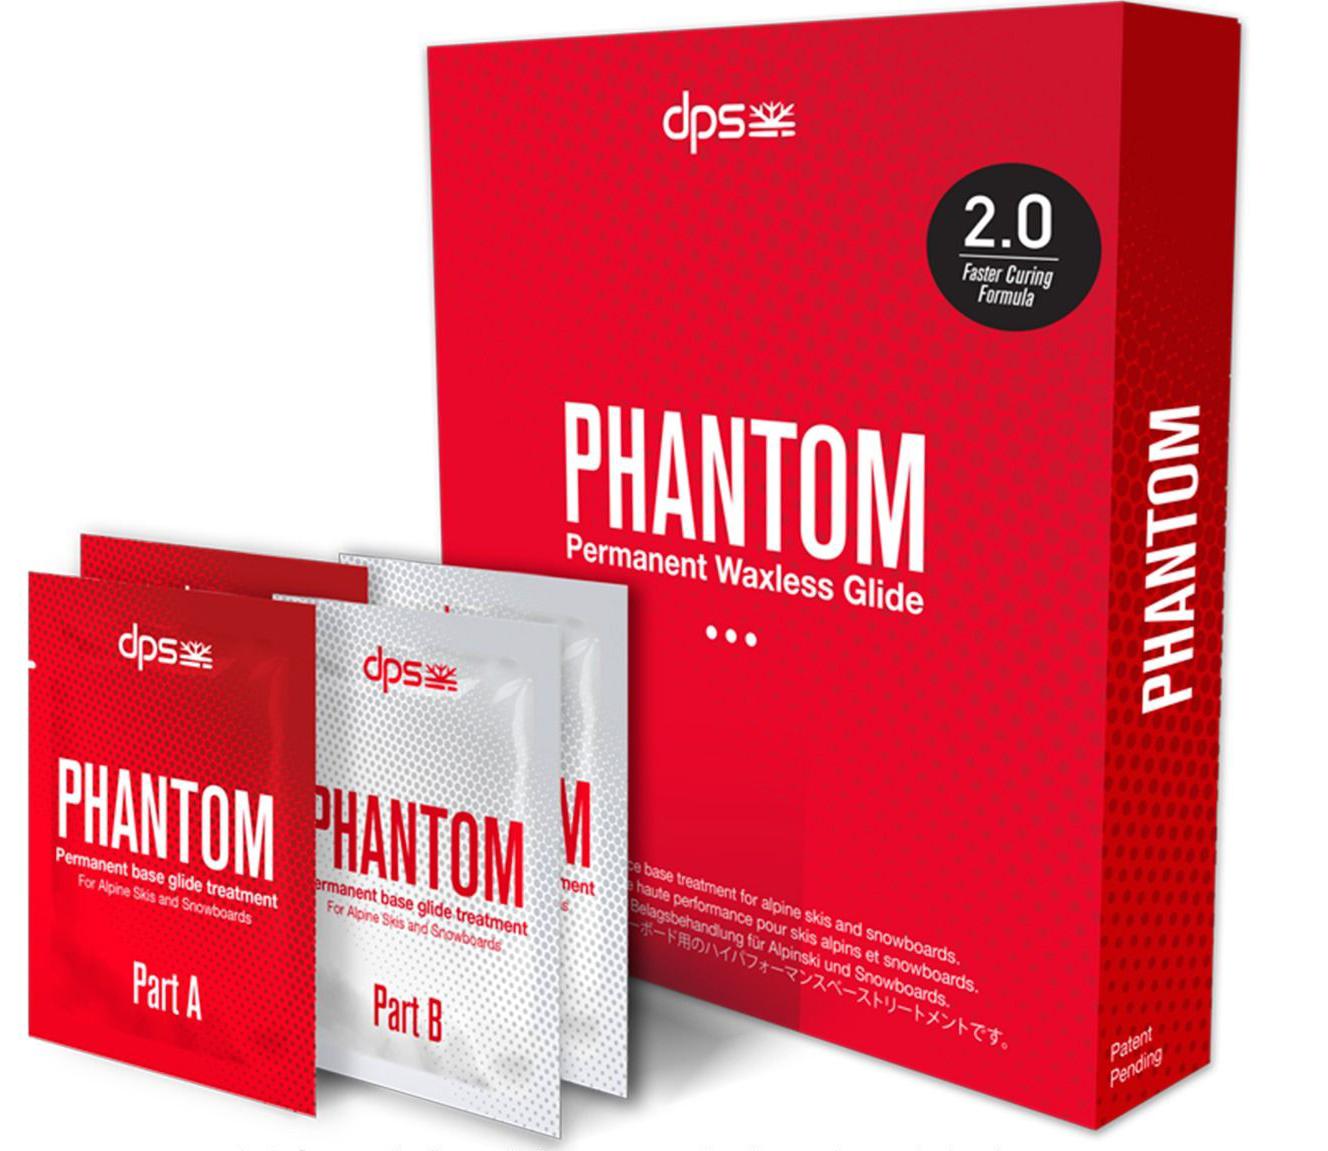 dps_phantom_wax_201.jpg